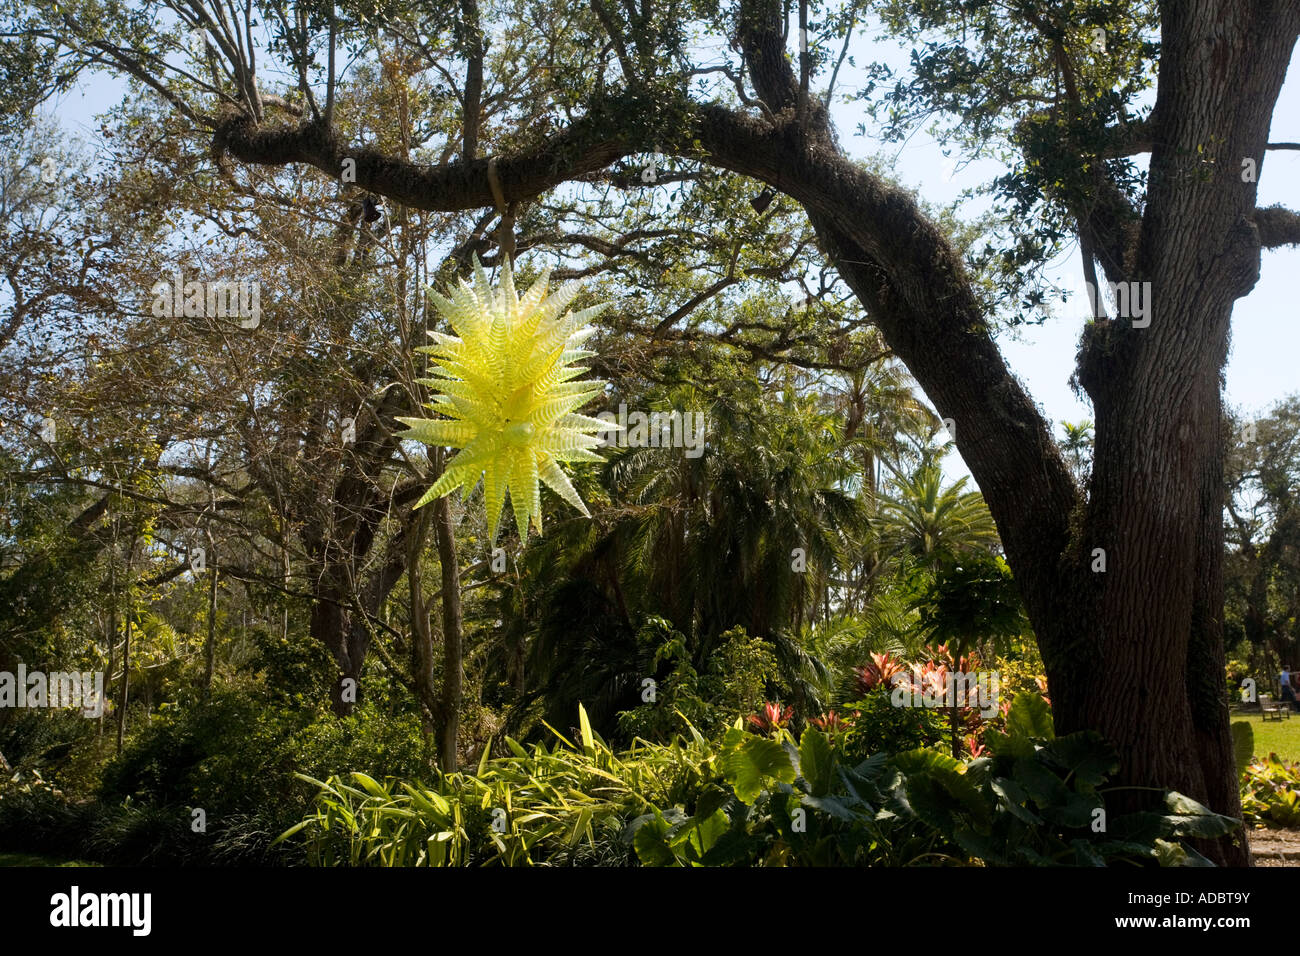 Fairchild Botanic Garden Miami Stock Photos & Fairchild Botanic ...